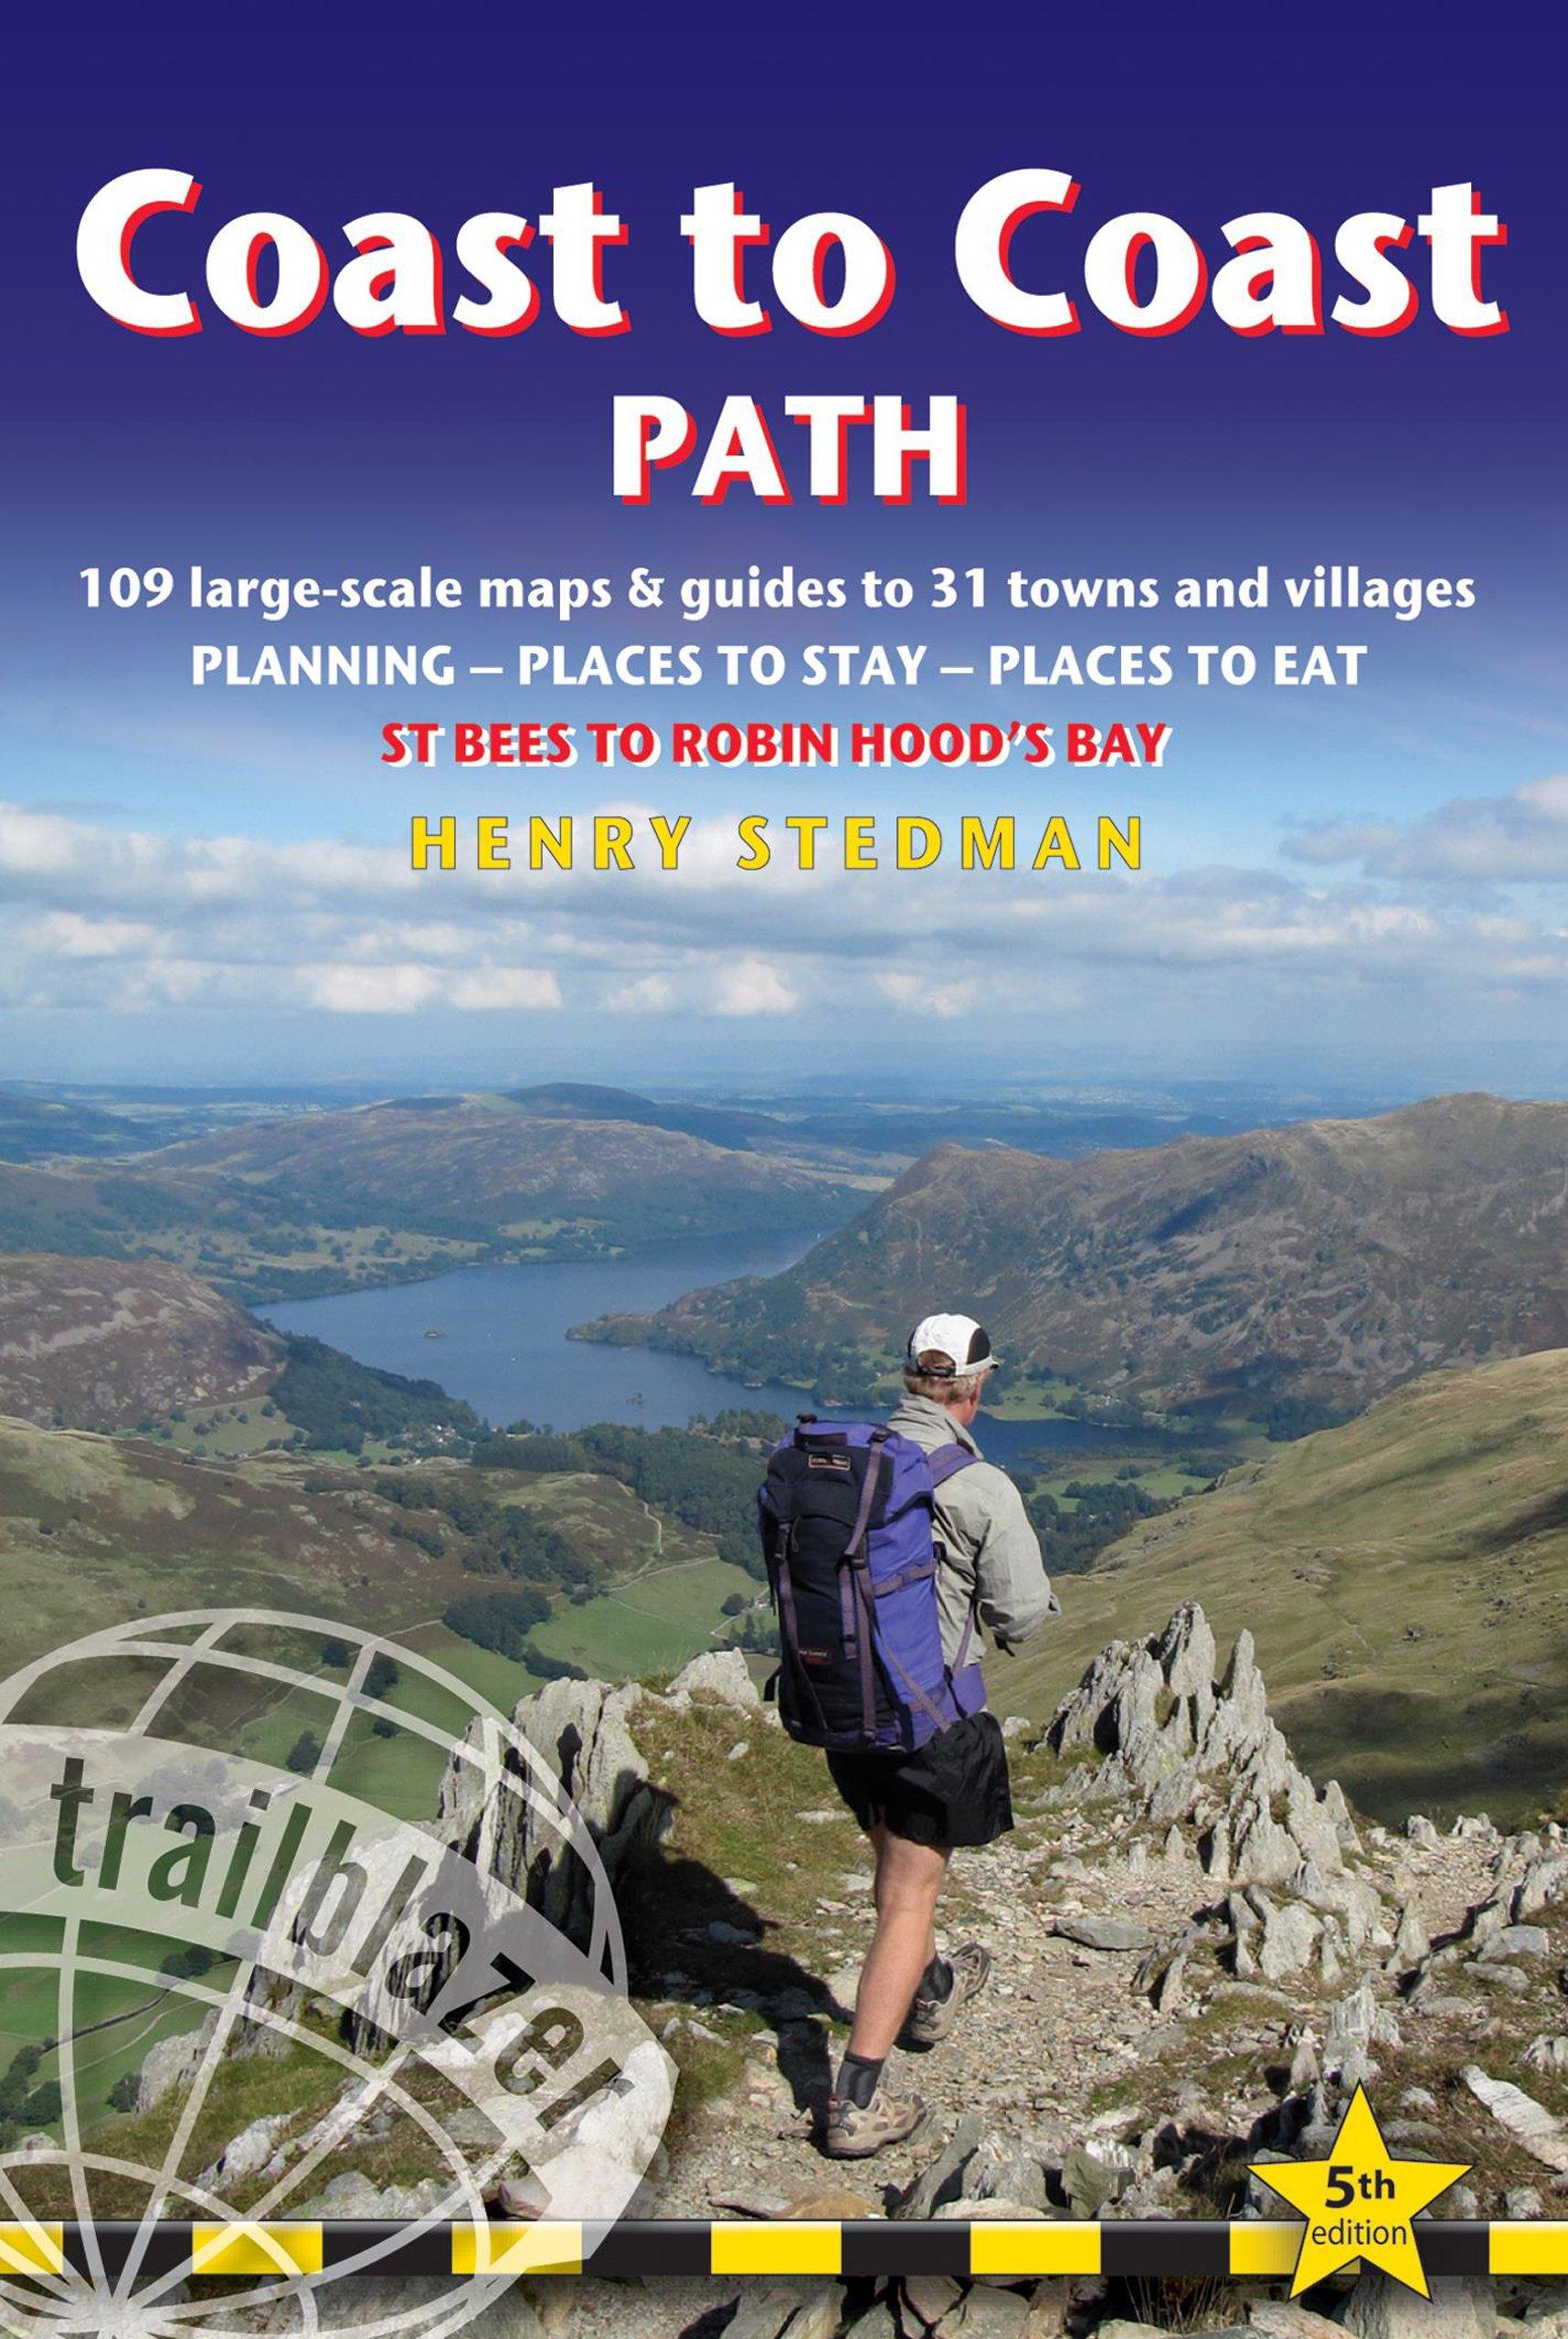 Coast to Coast Path: St Bees to Robin Hood's Bay (Trailblazer Guide)